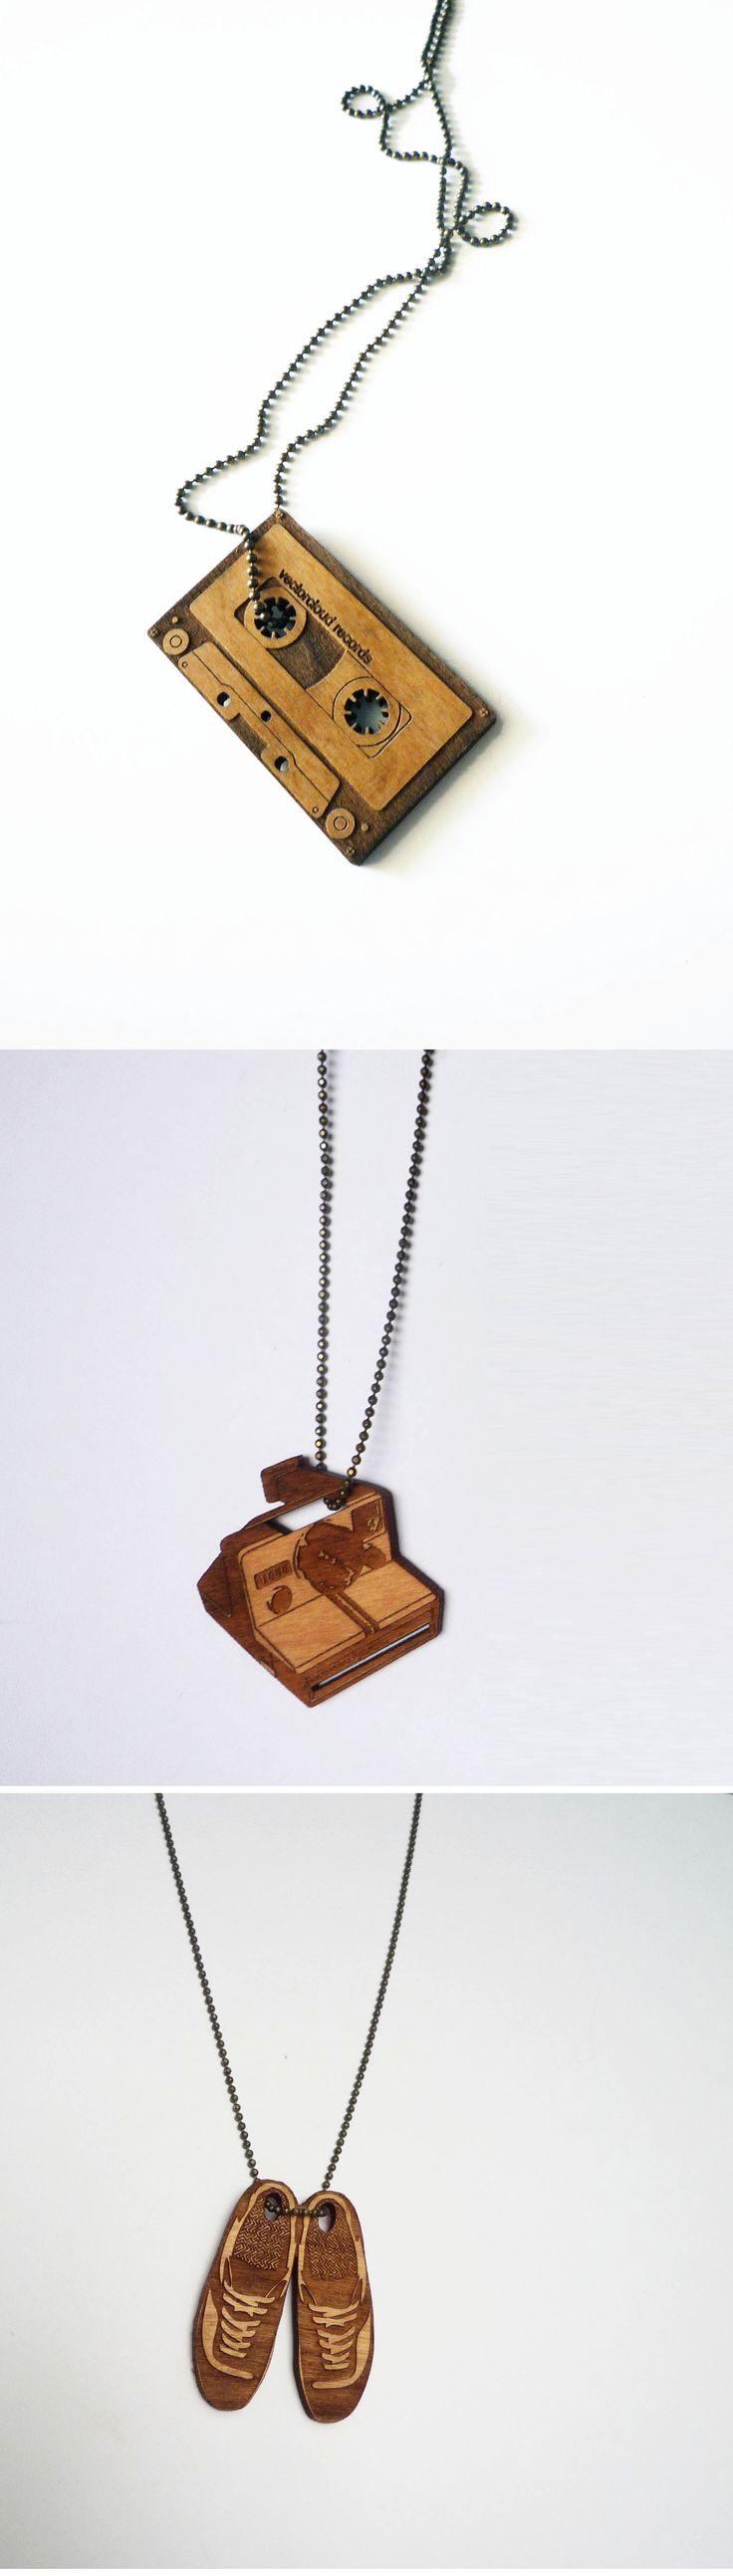 Laser cut necklace, laser engraved, wooden necklace, cassette, polaroid camera, shoes